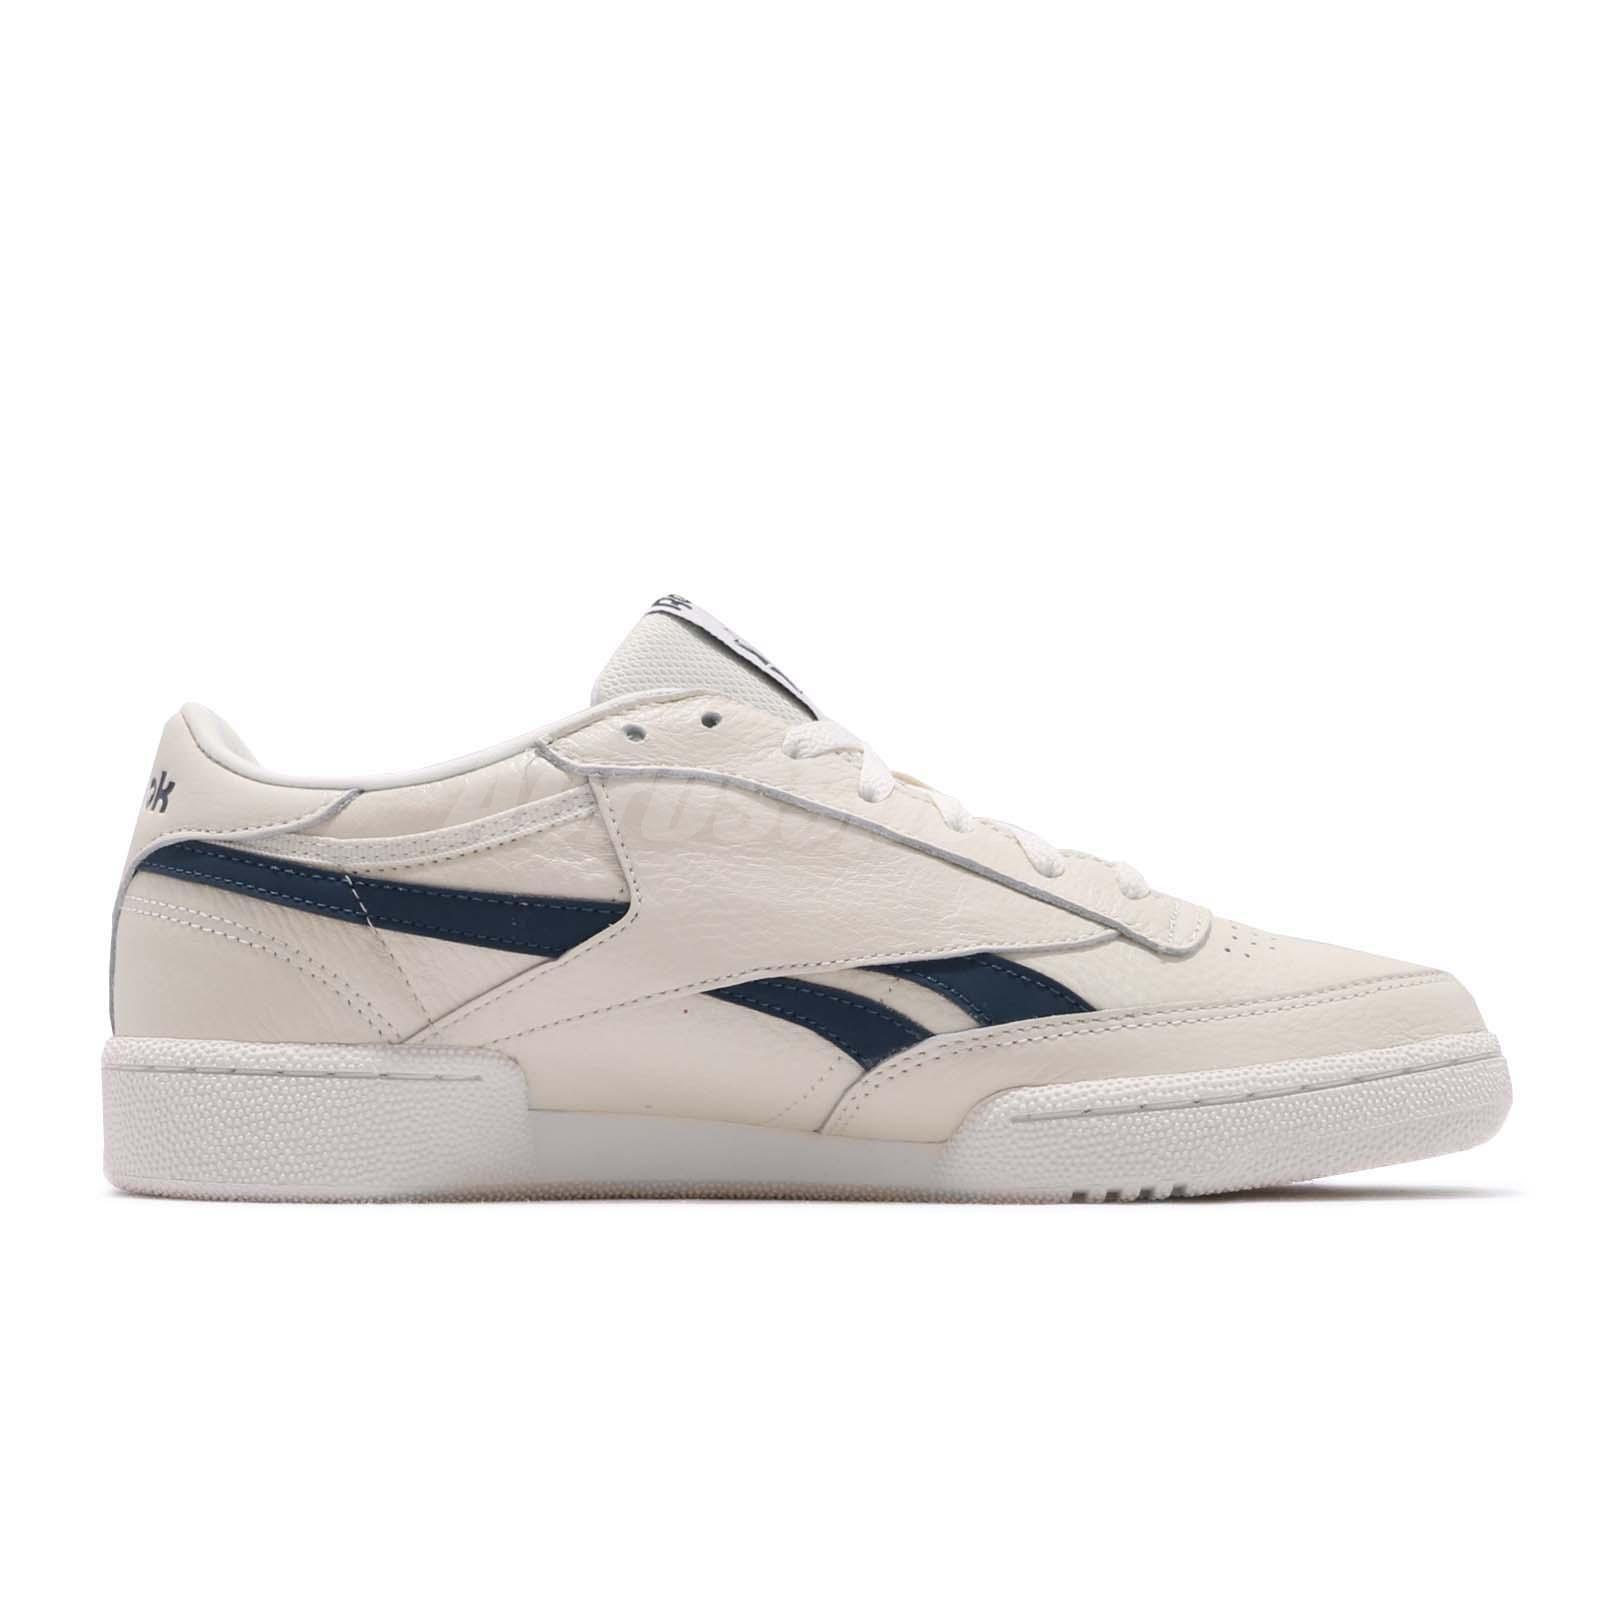 20d8dadd Details about Reebok Revenge Plus Classic White Blue Hills Men Casual Shoes  Sneakers DV7029